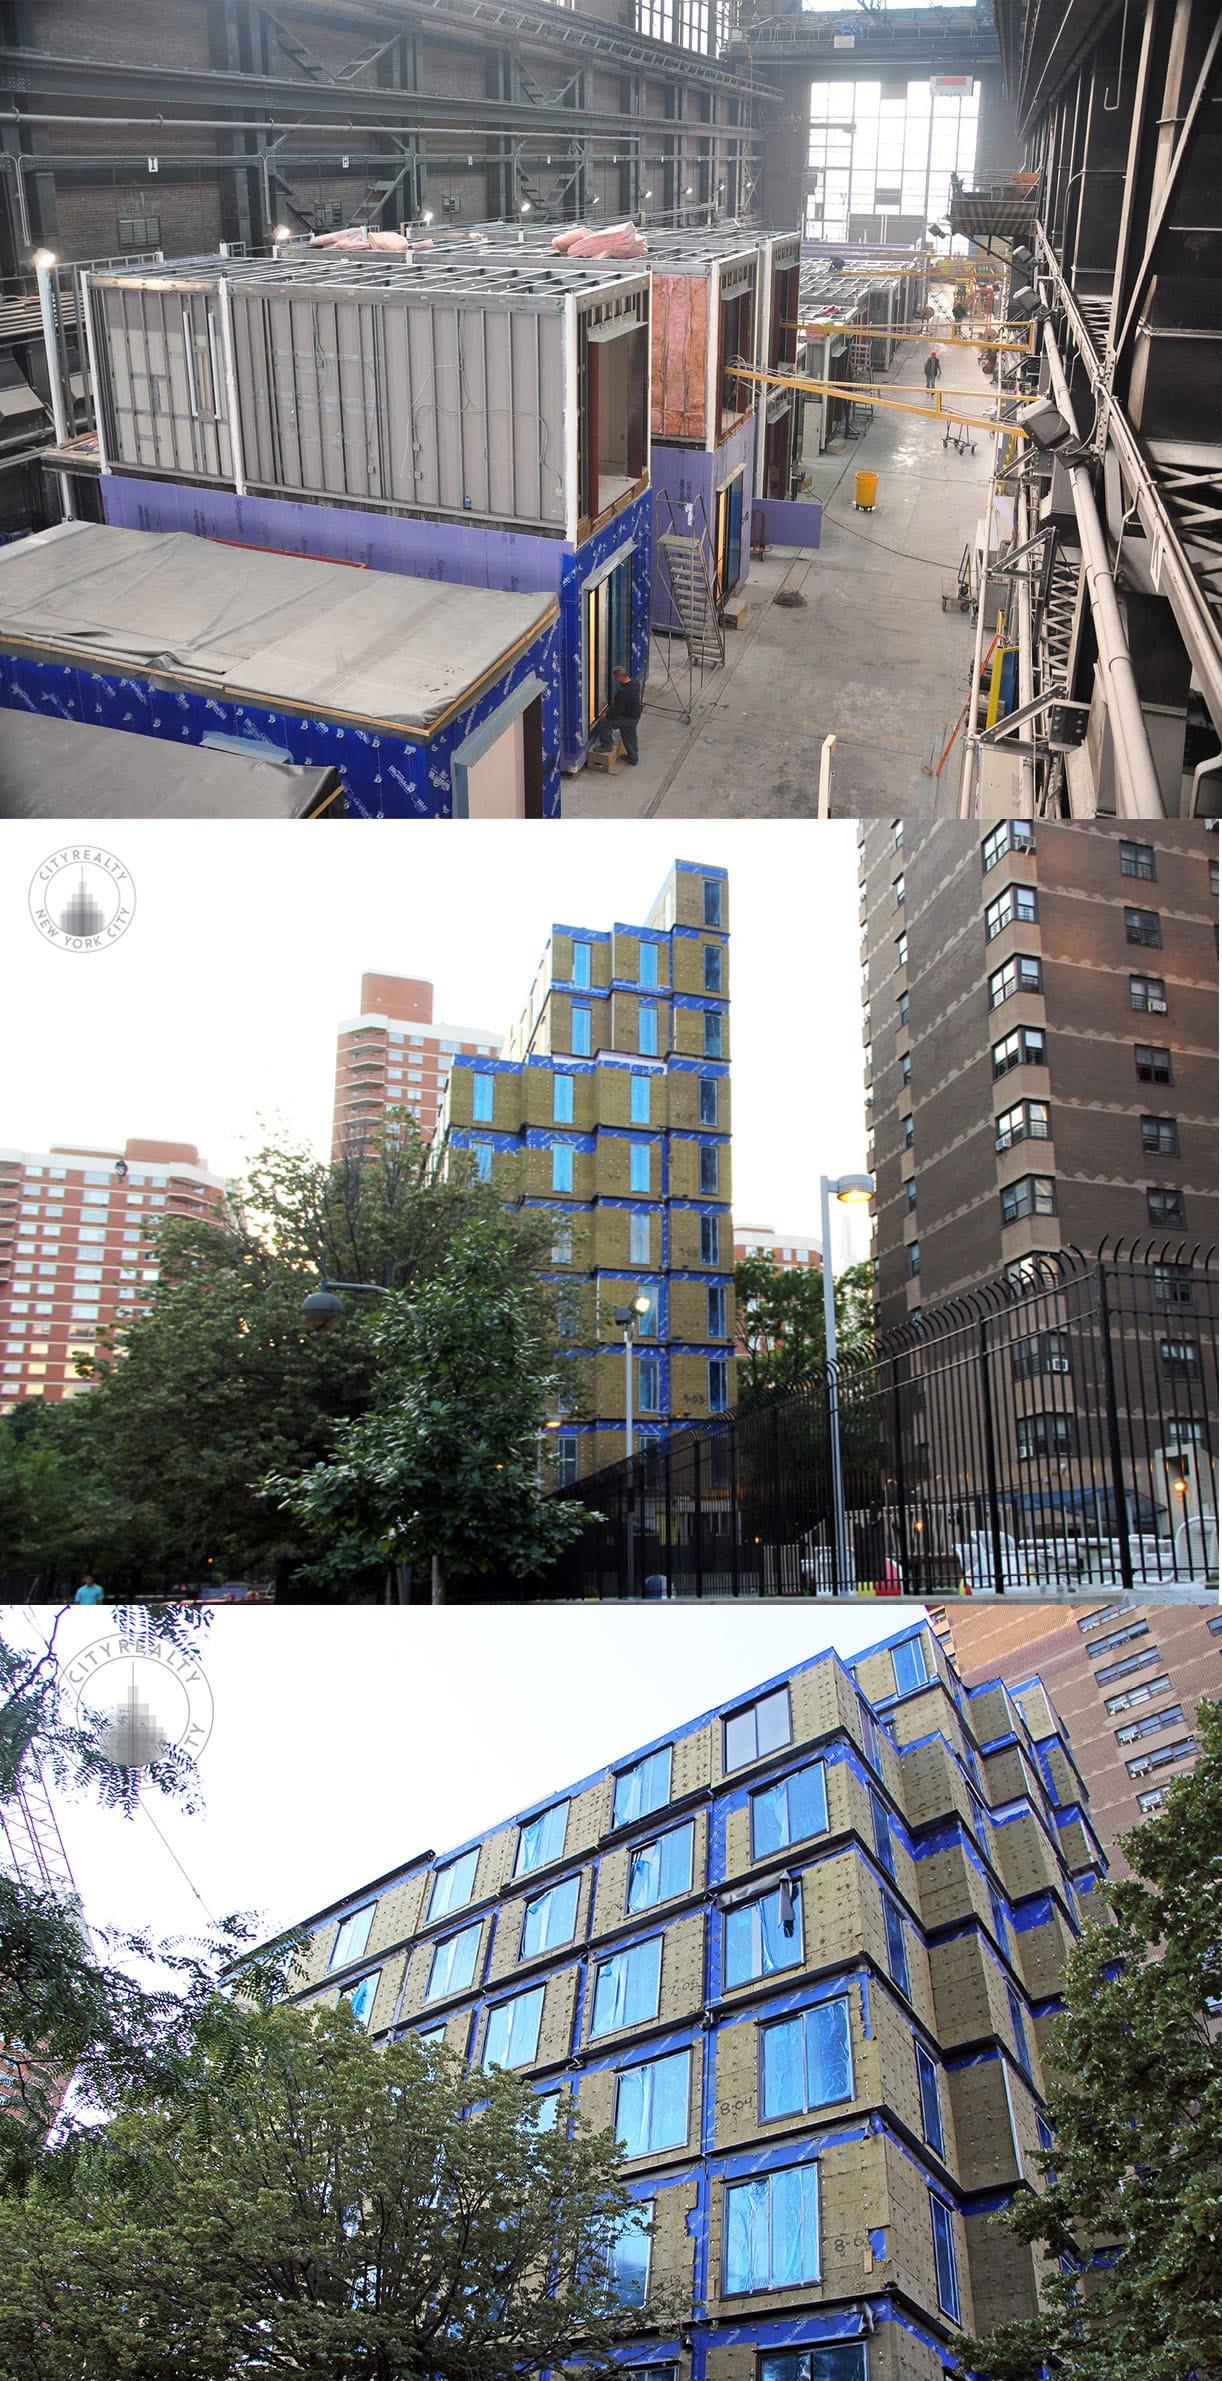 My Micro NY - oprimeiro edifício de microapartamentos de Nova York stylo urbano